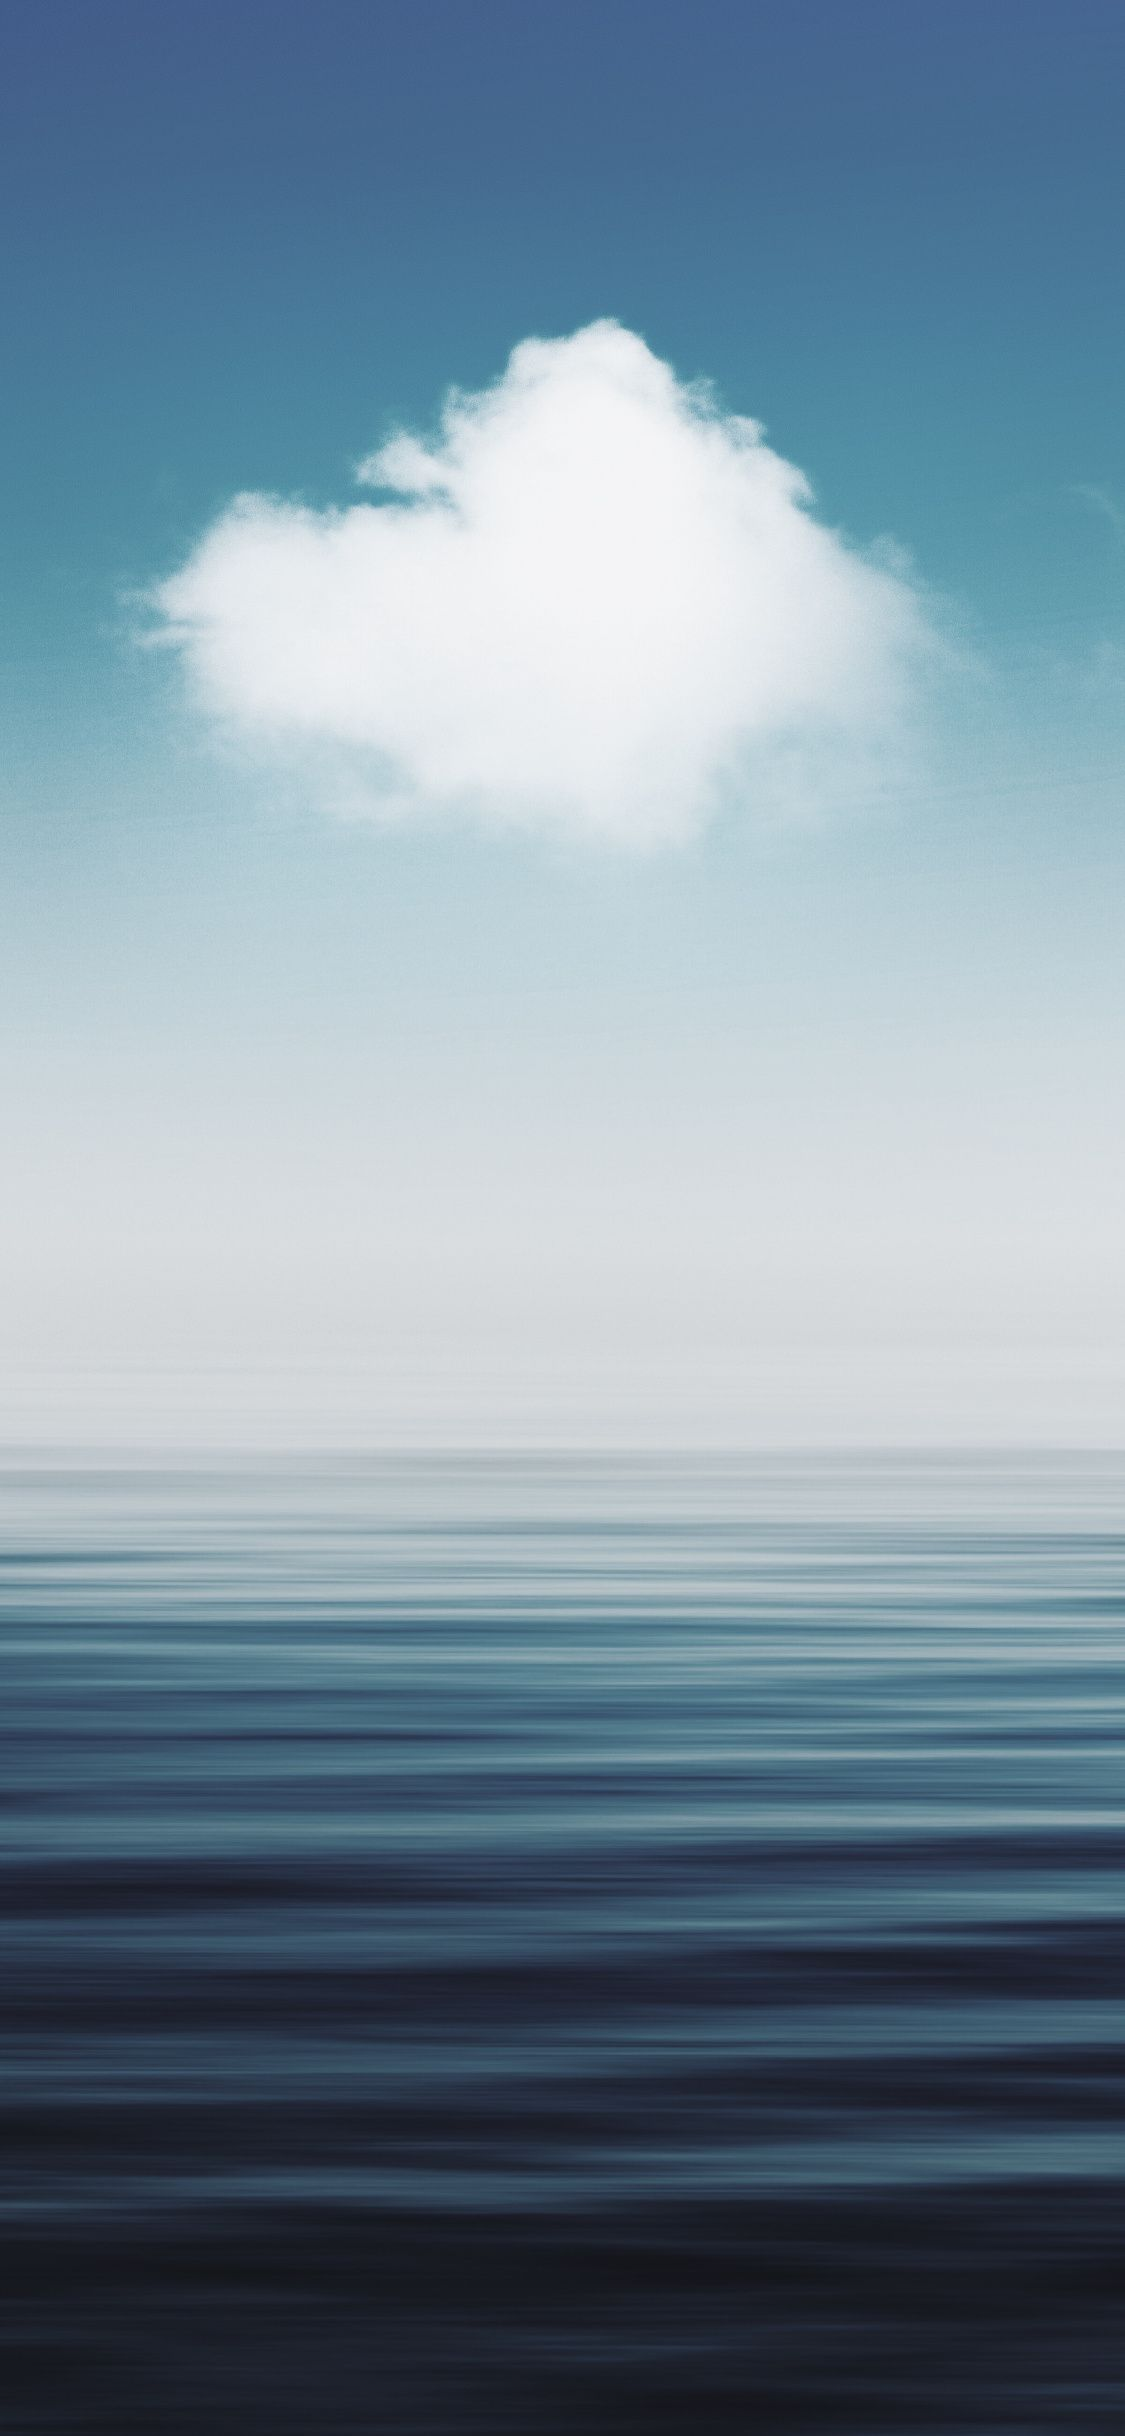 1125x2436 Seascape Blur Sea And Sky Nature Wallpaper Cool Landscapes Nature Wallpaper Sky